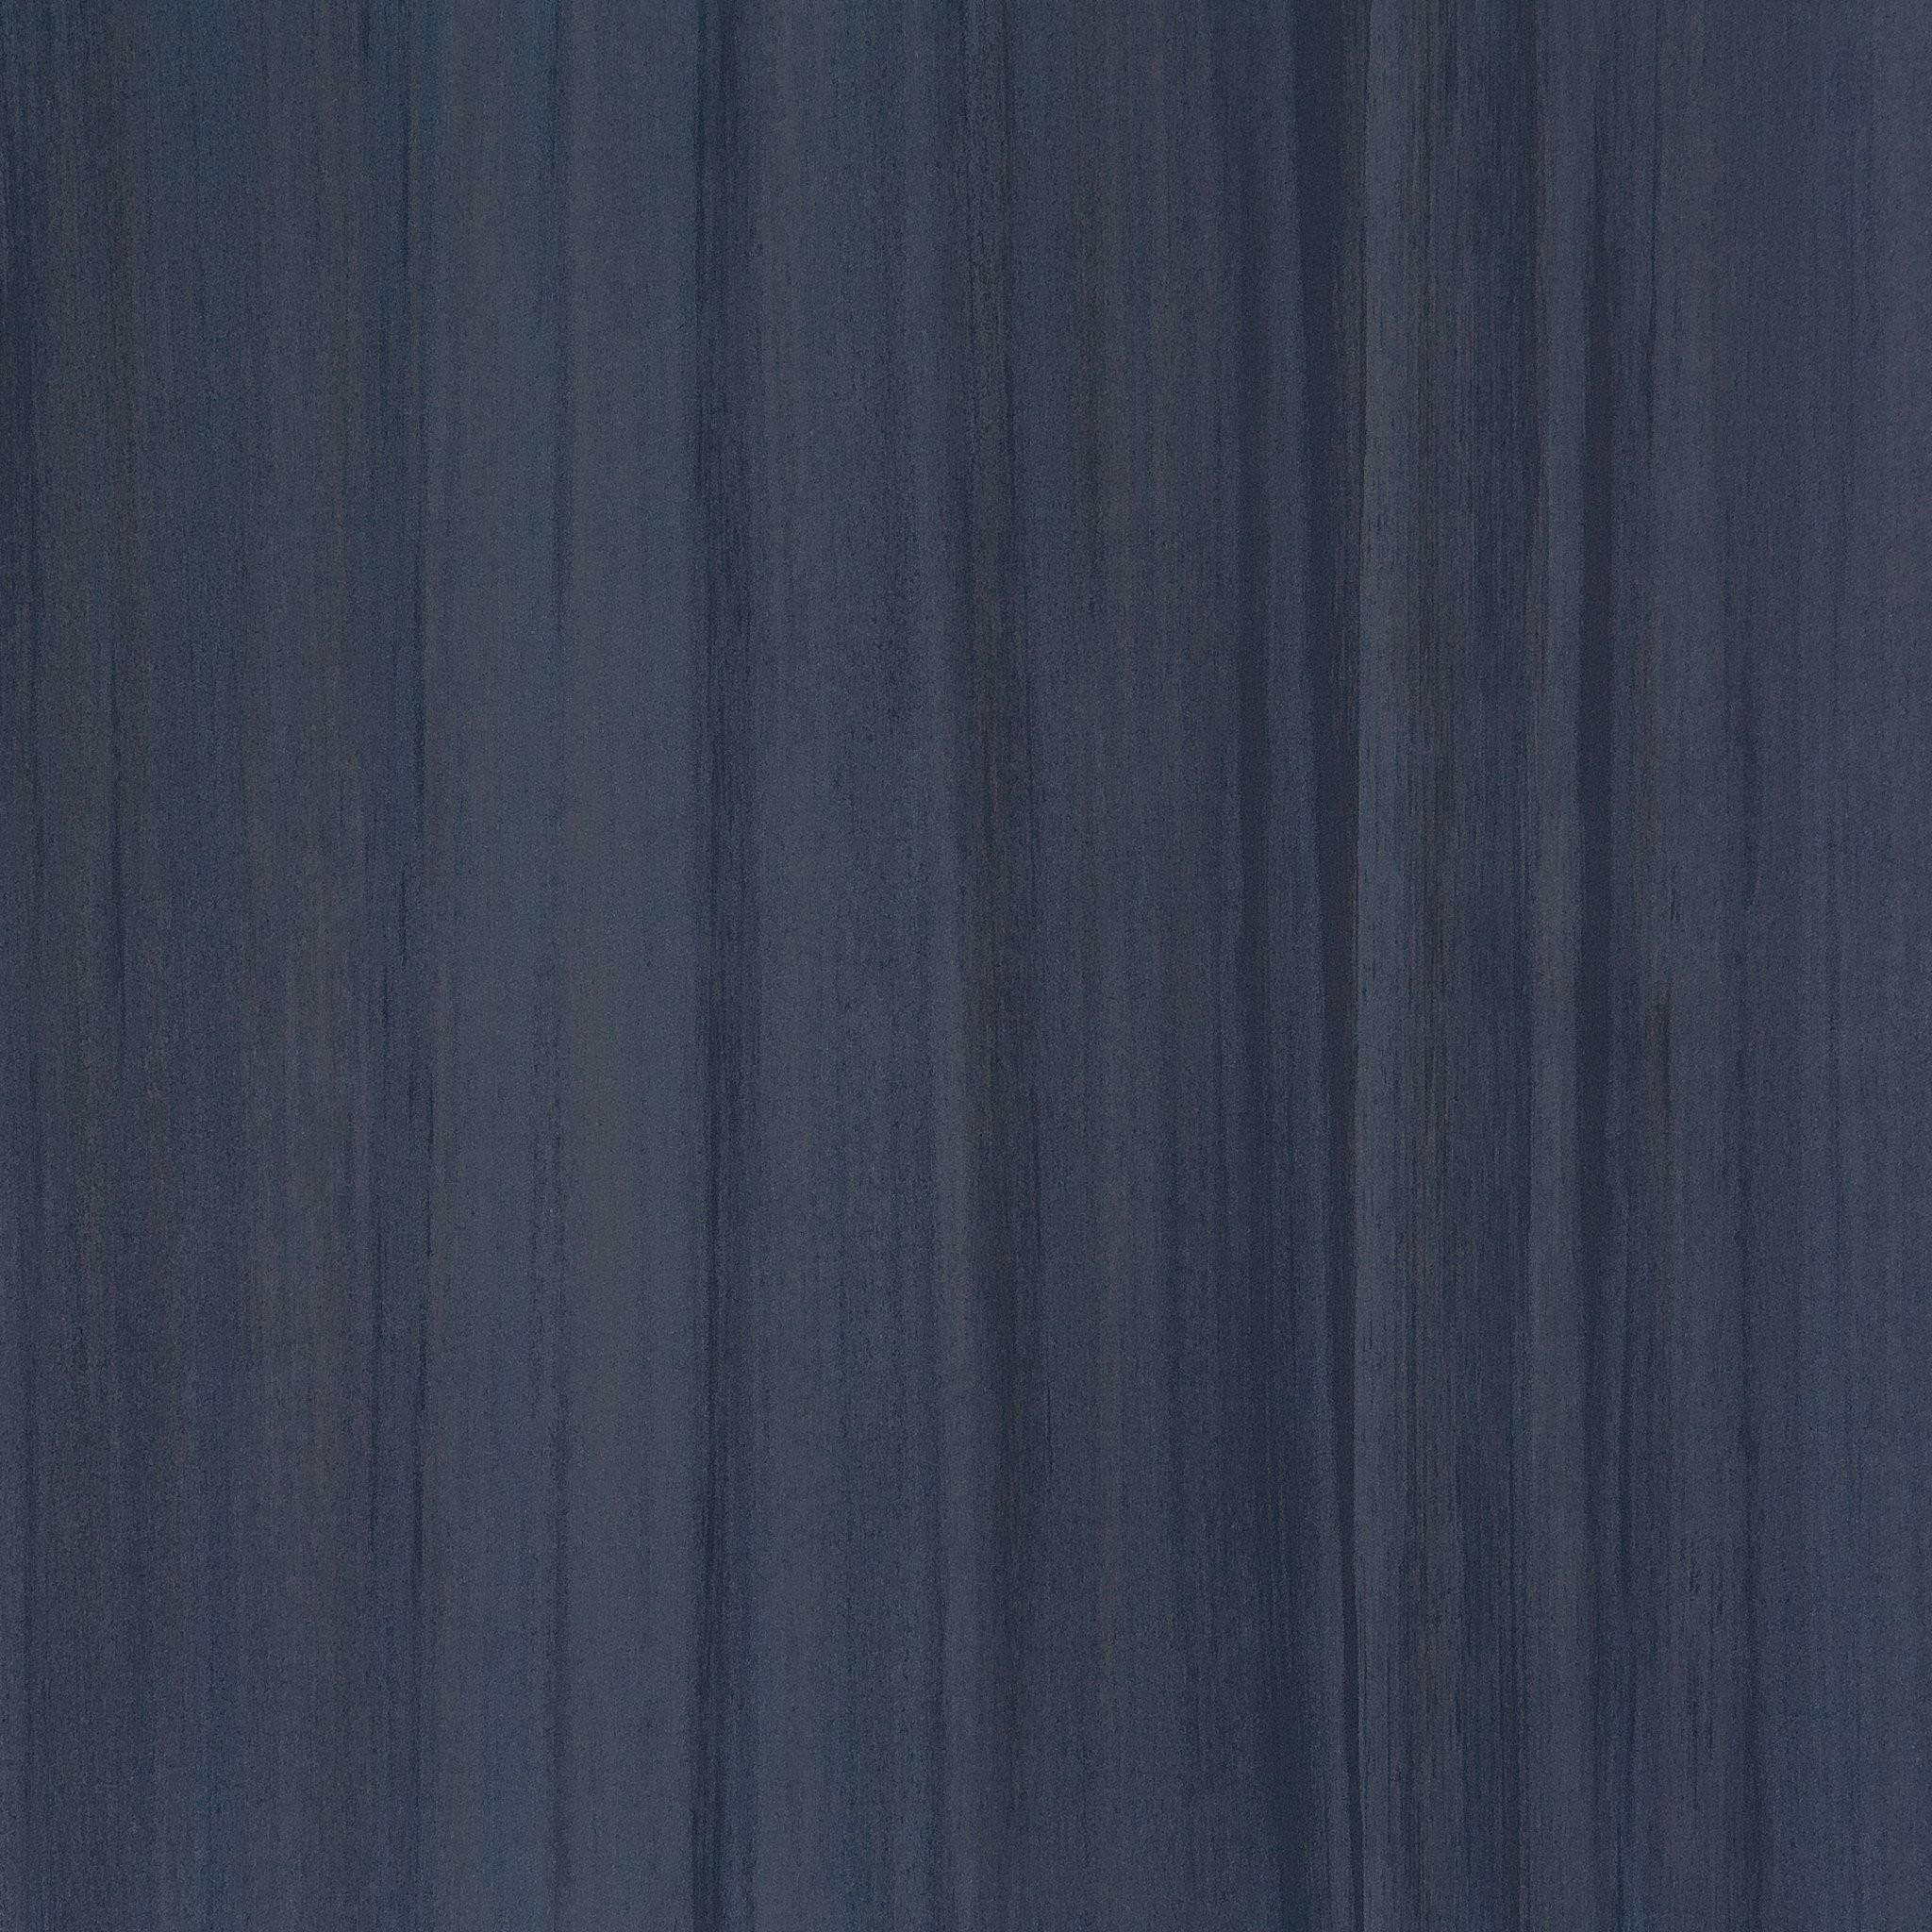 Irregular Stripes Wallpaper in Dark Grey design by BD Wall